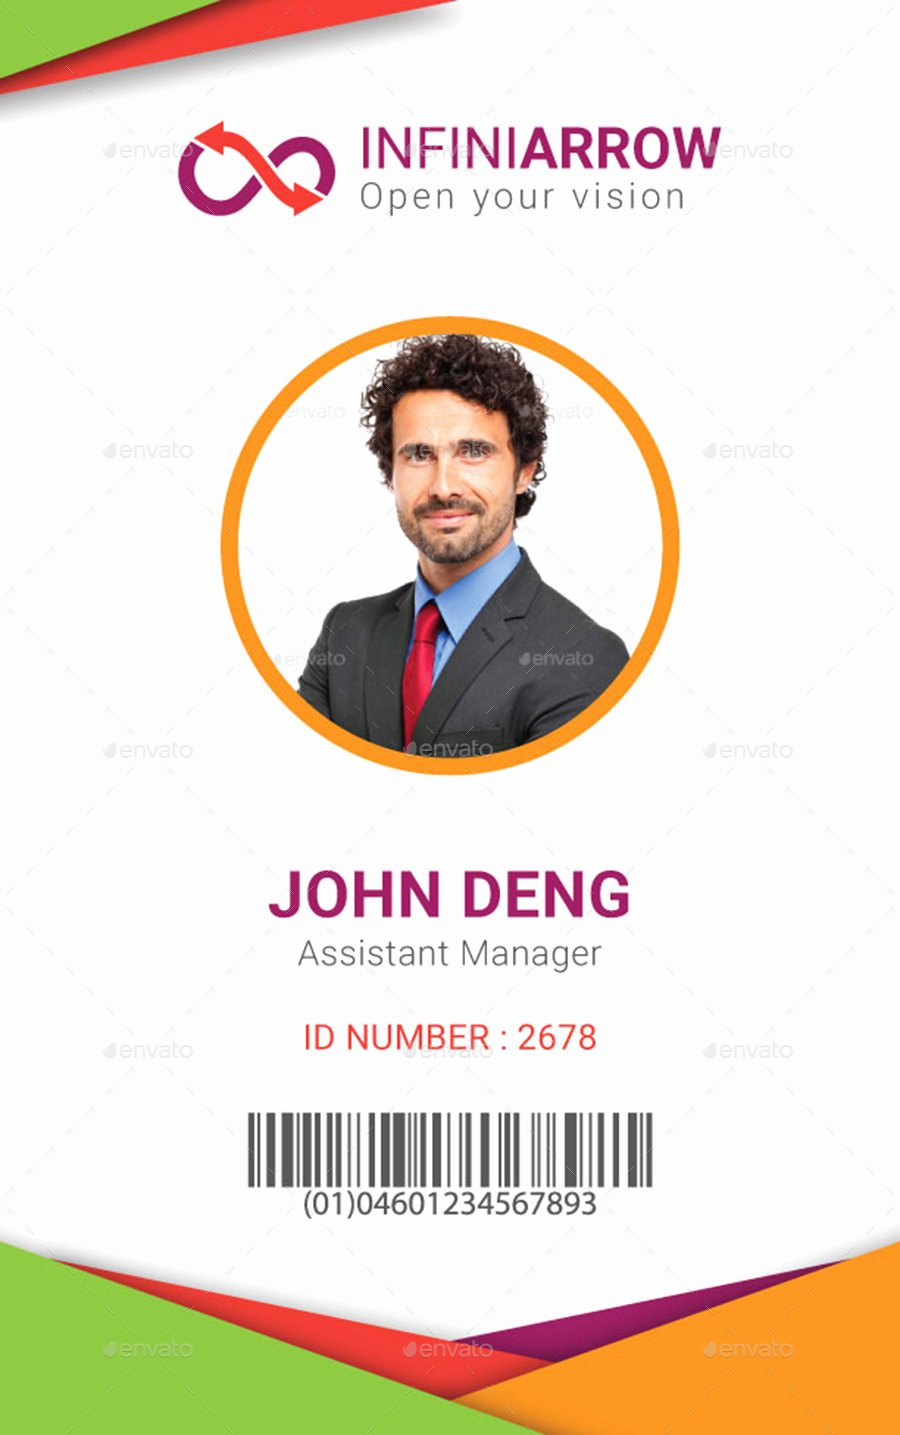 Multipurpose Business Id Card Template by Dotnpix